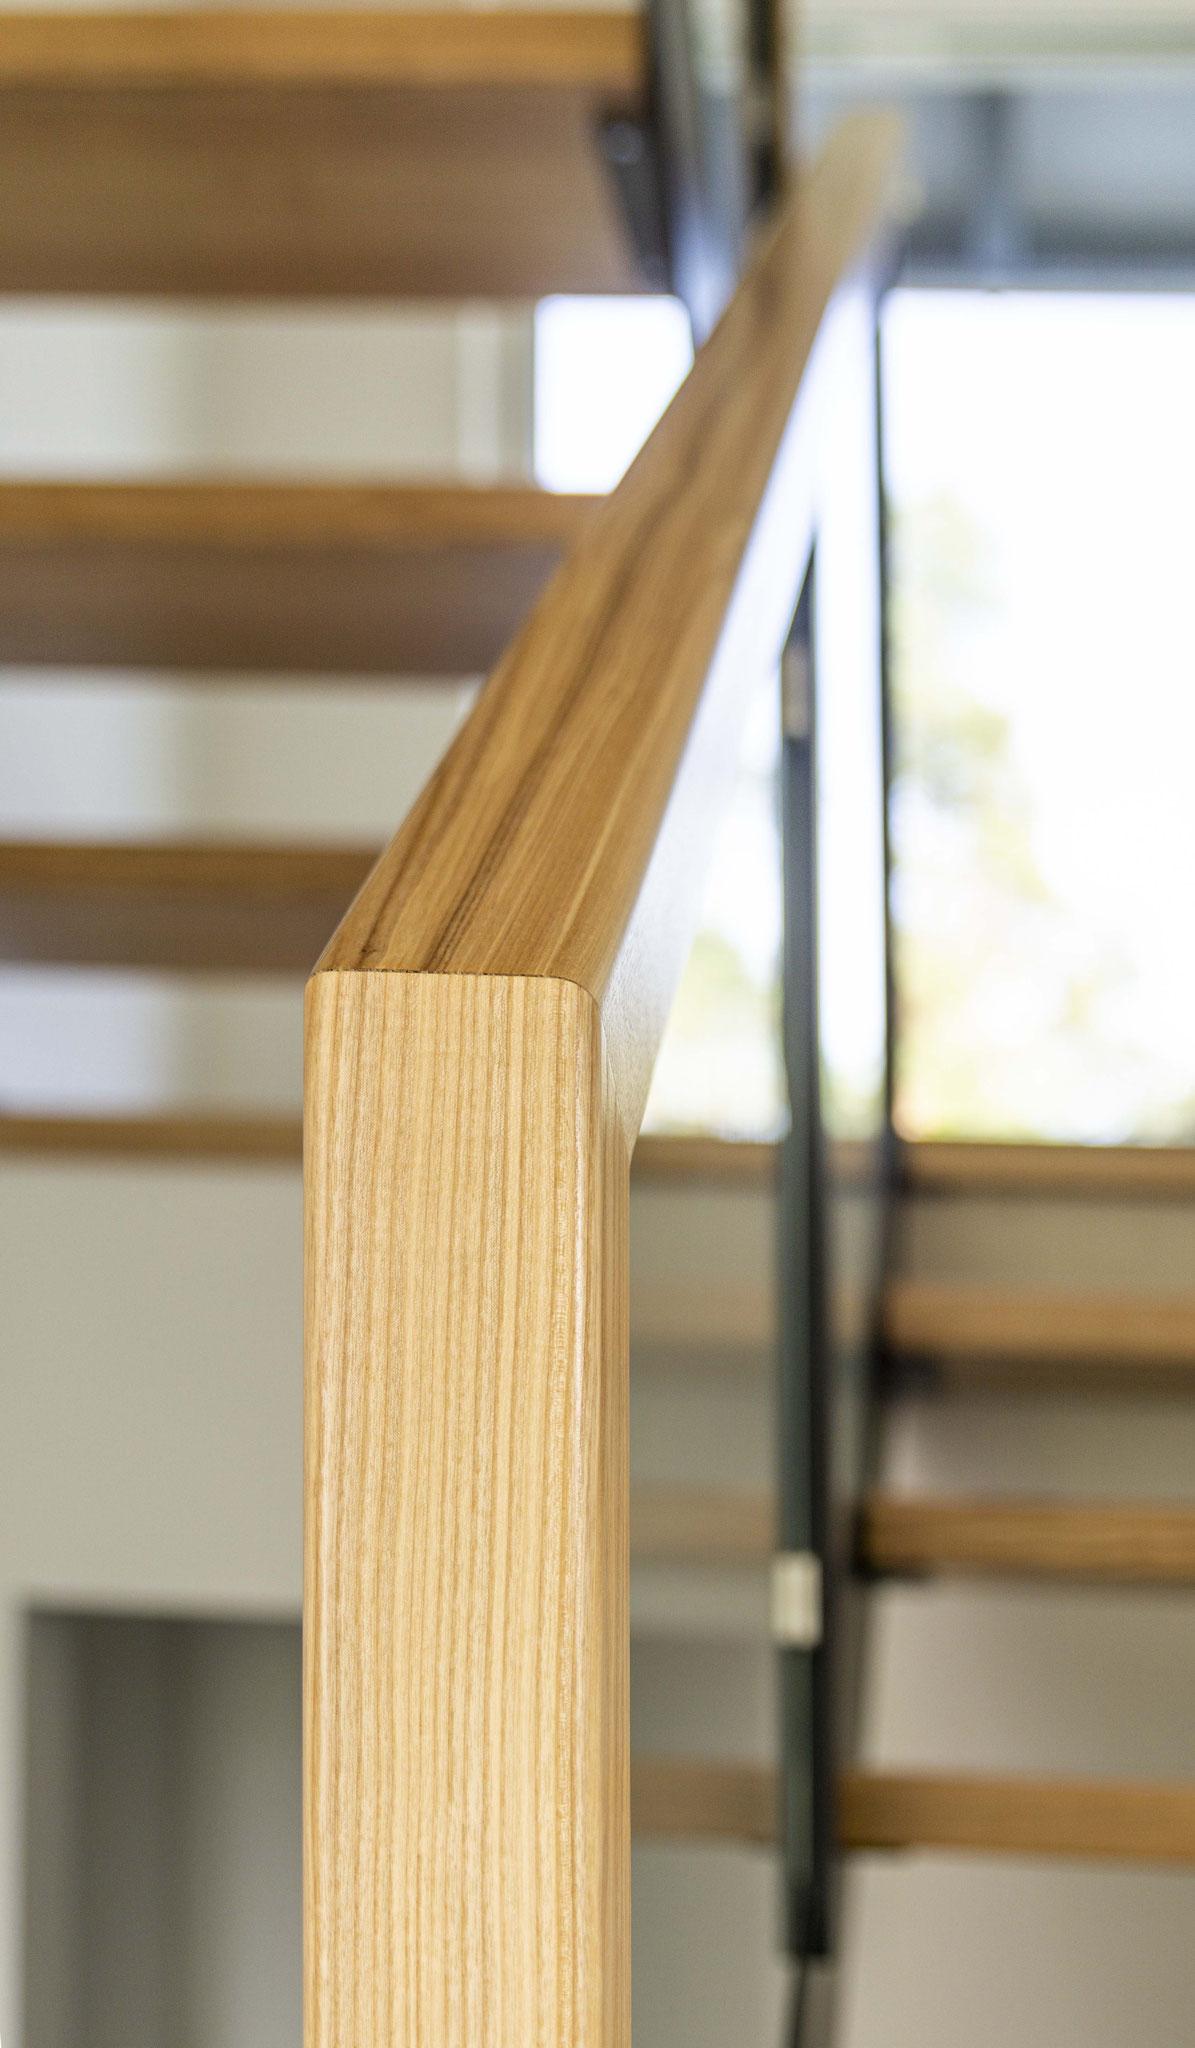 Holz bestimmt im Innenbereich die klare Optik. Foto: Dominik Frank